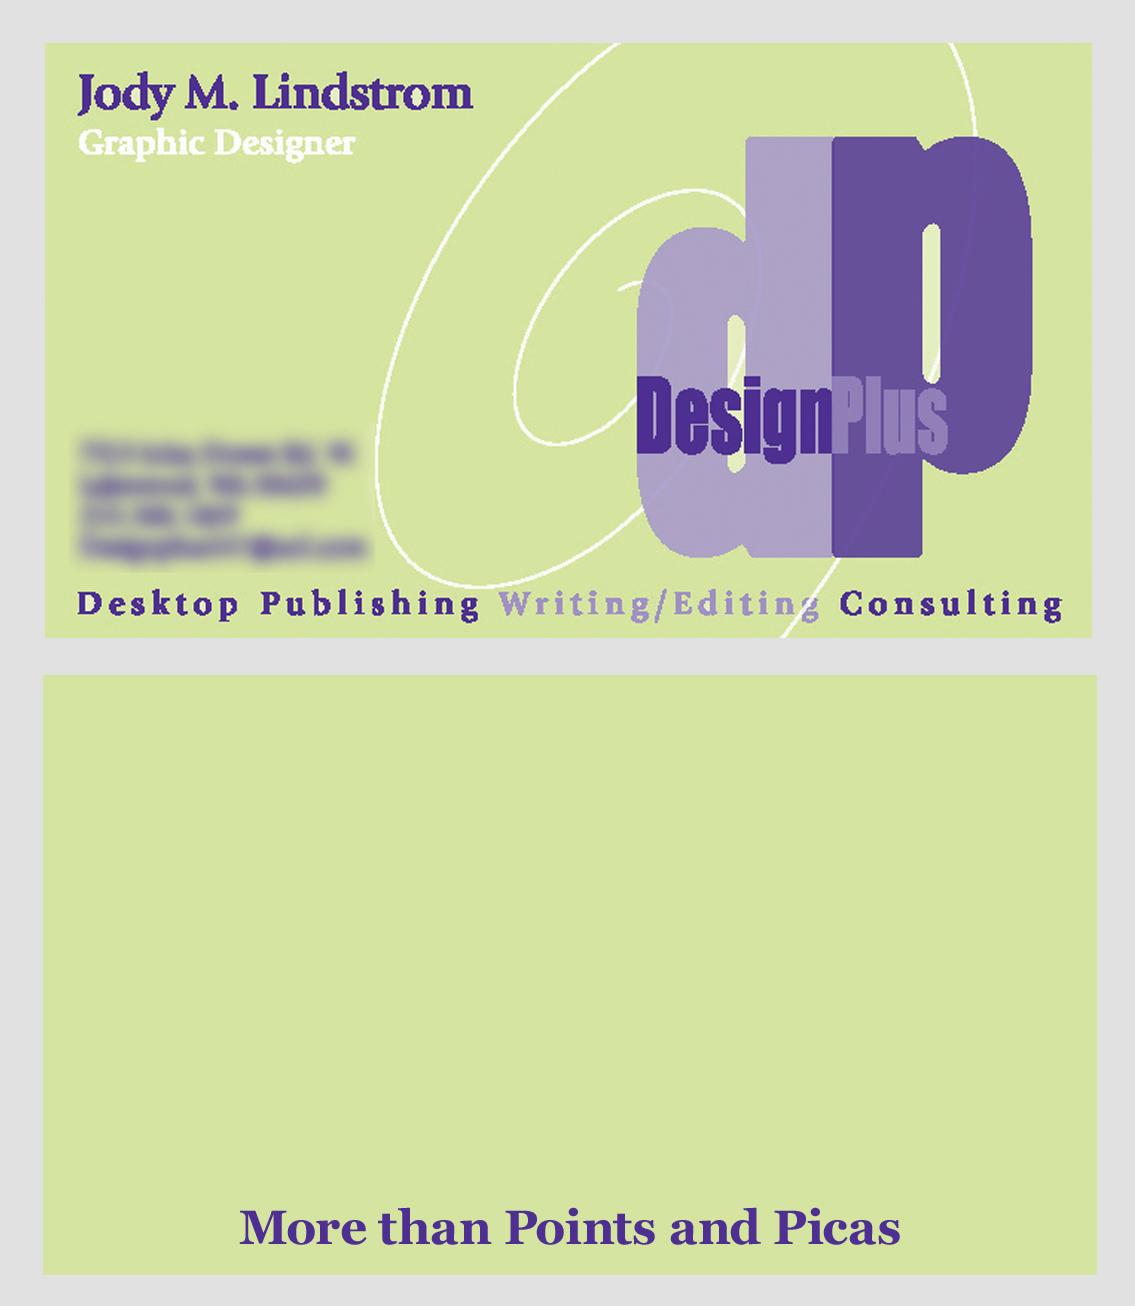 Design Plus Business Card